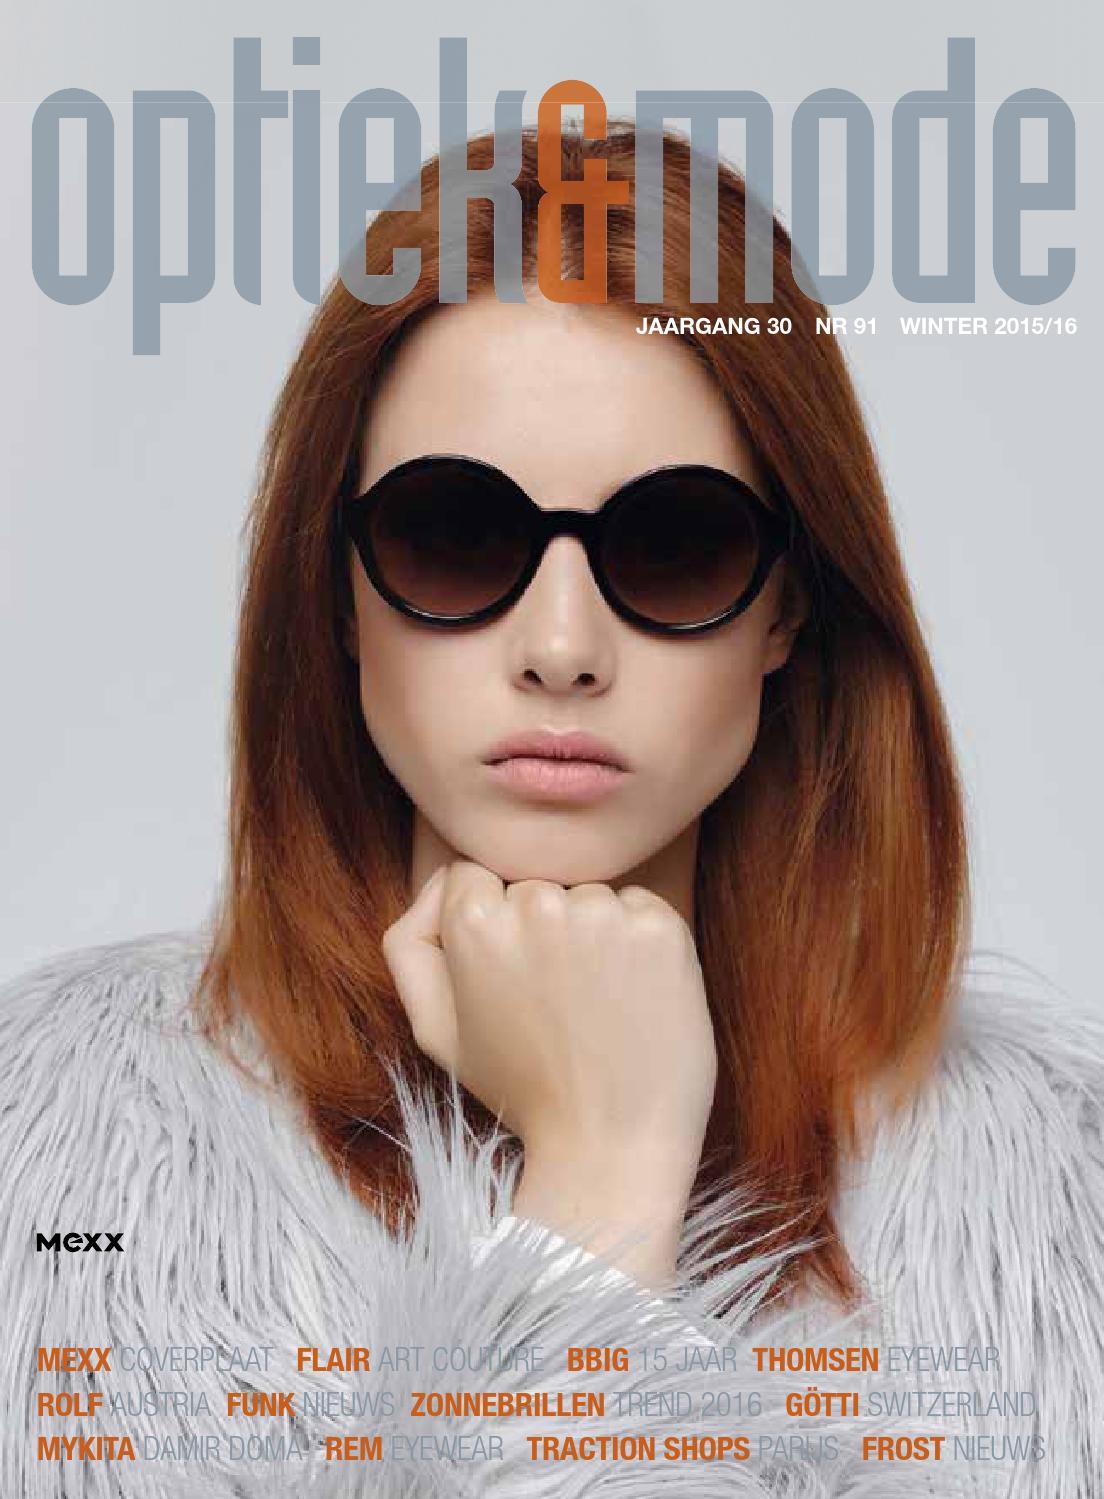 Optiek & mode 91 by commapublishing   issuu